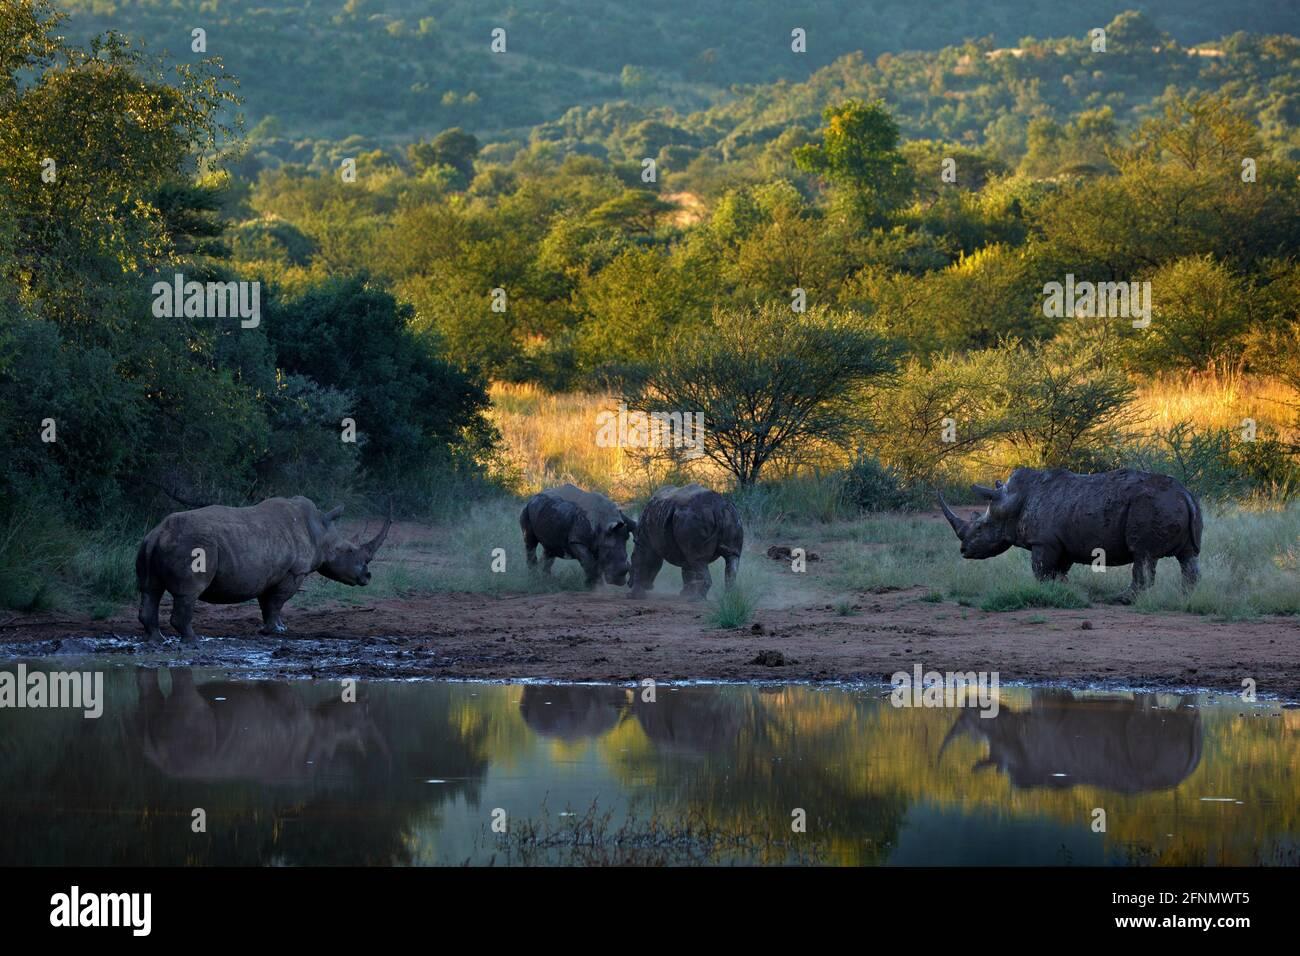 Rhinoceros in Pilanesberg NP, South Africa. White rhinoceros, Ceratotherium simum, big animal in the African nature, near the water. Wildlife scene fr Stock Photo